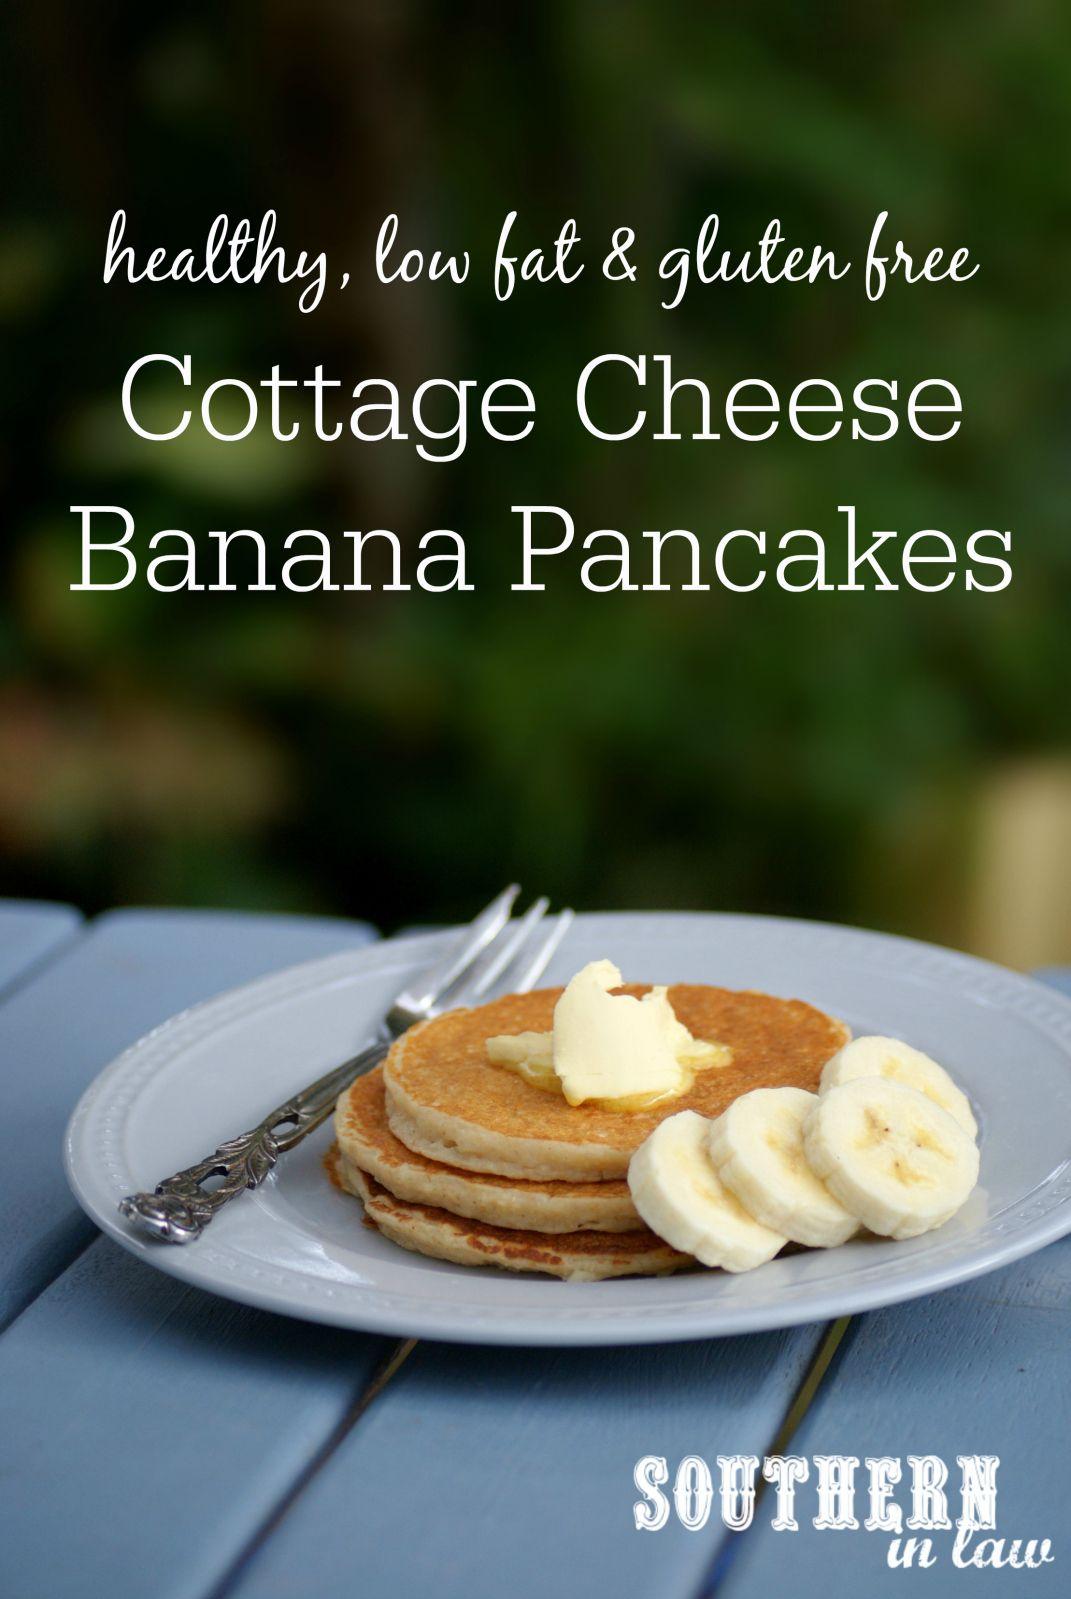 Recipe Healthy Cottage Cheese Banana Pancakes Cottage Cheese Recipes Banana Pancakes Banana Pancakes Recipe Healthy